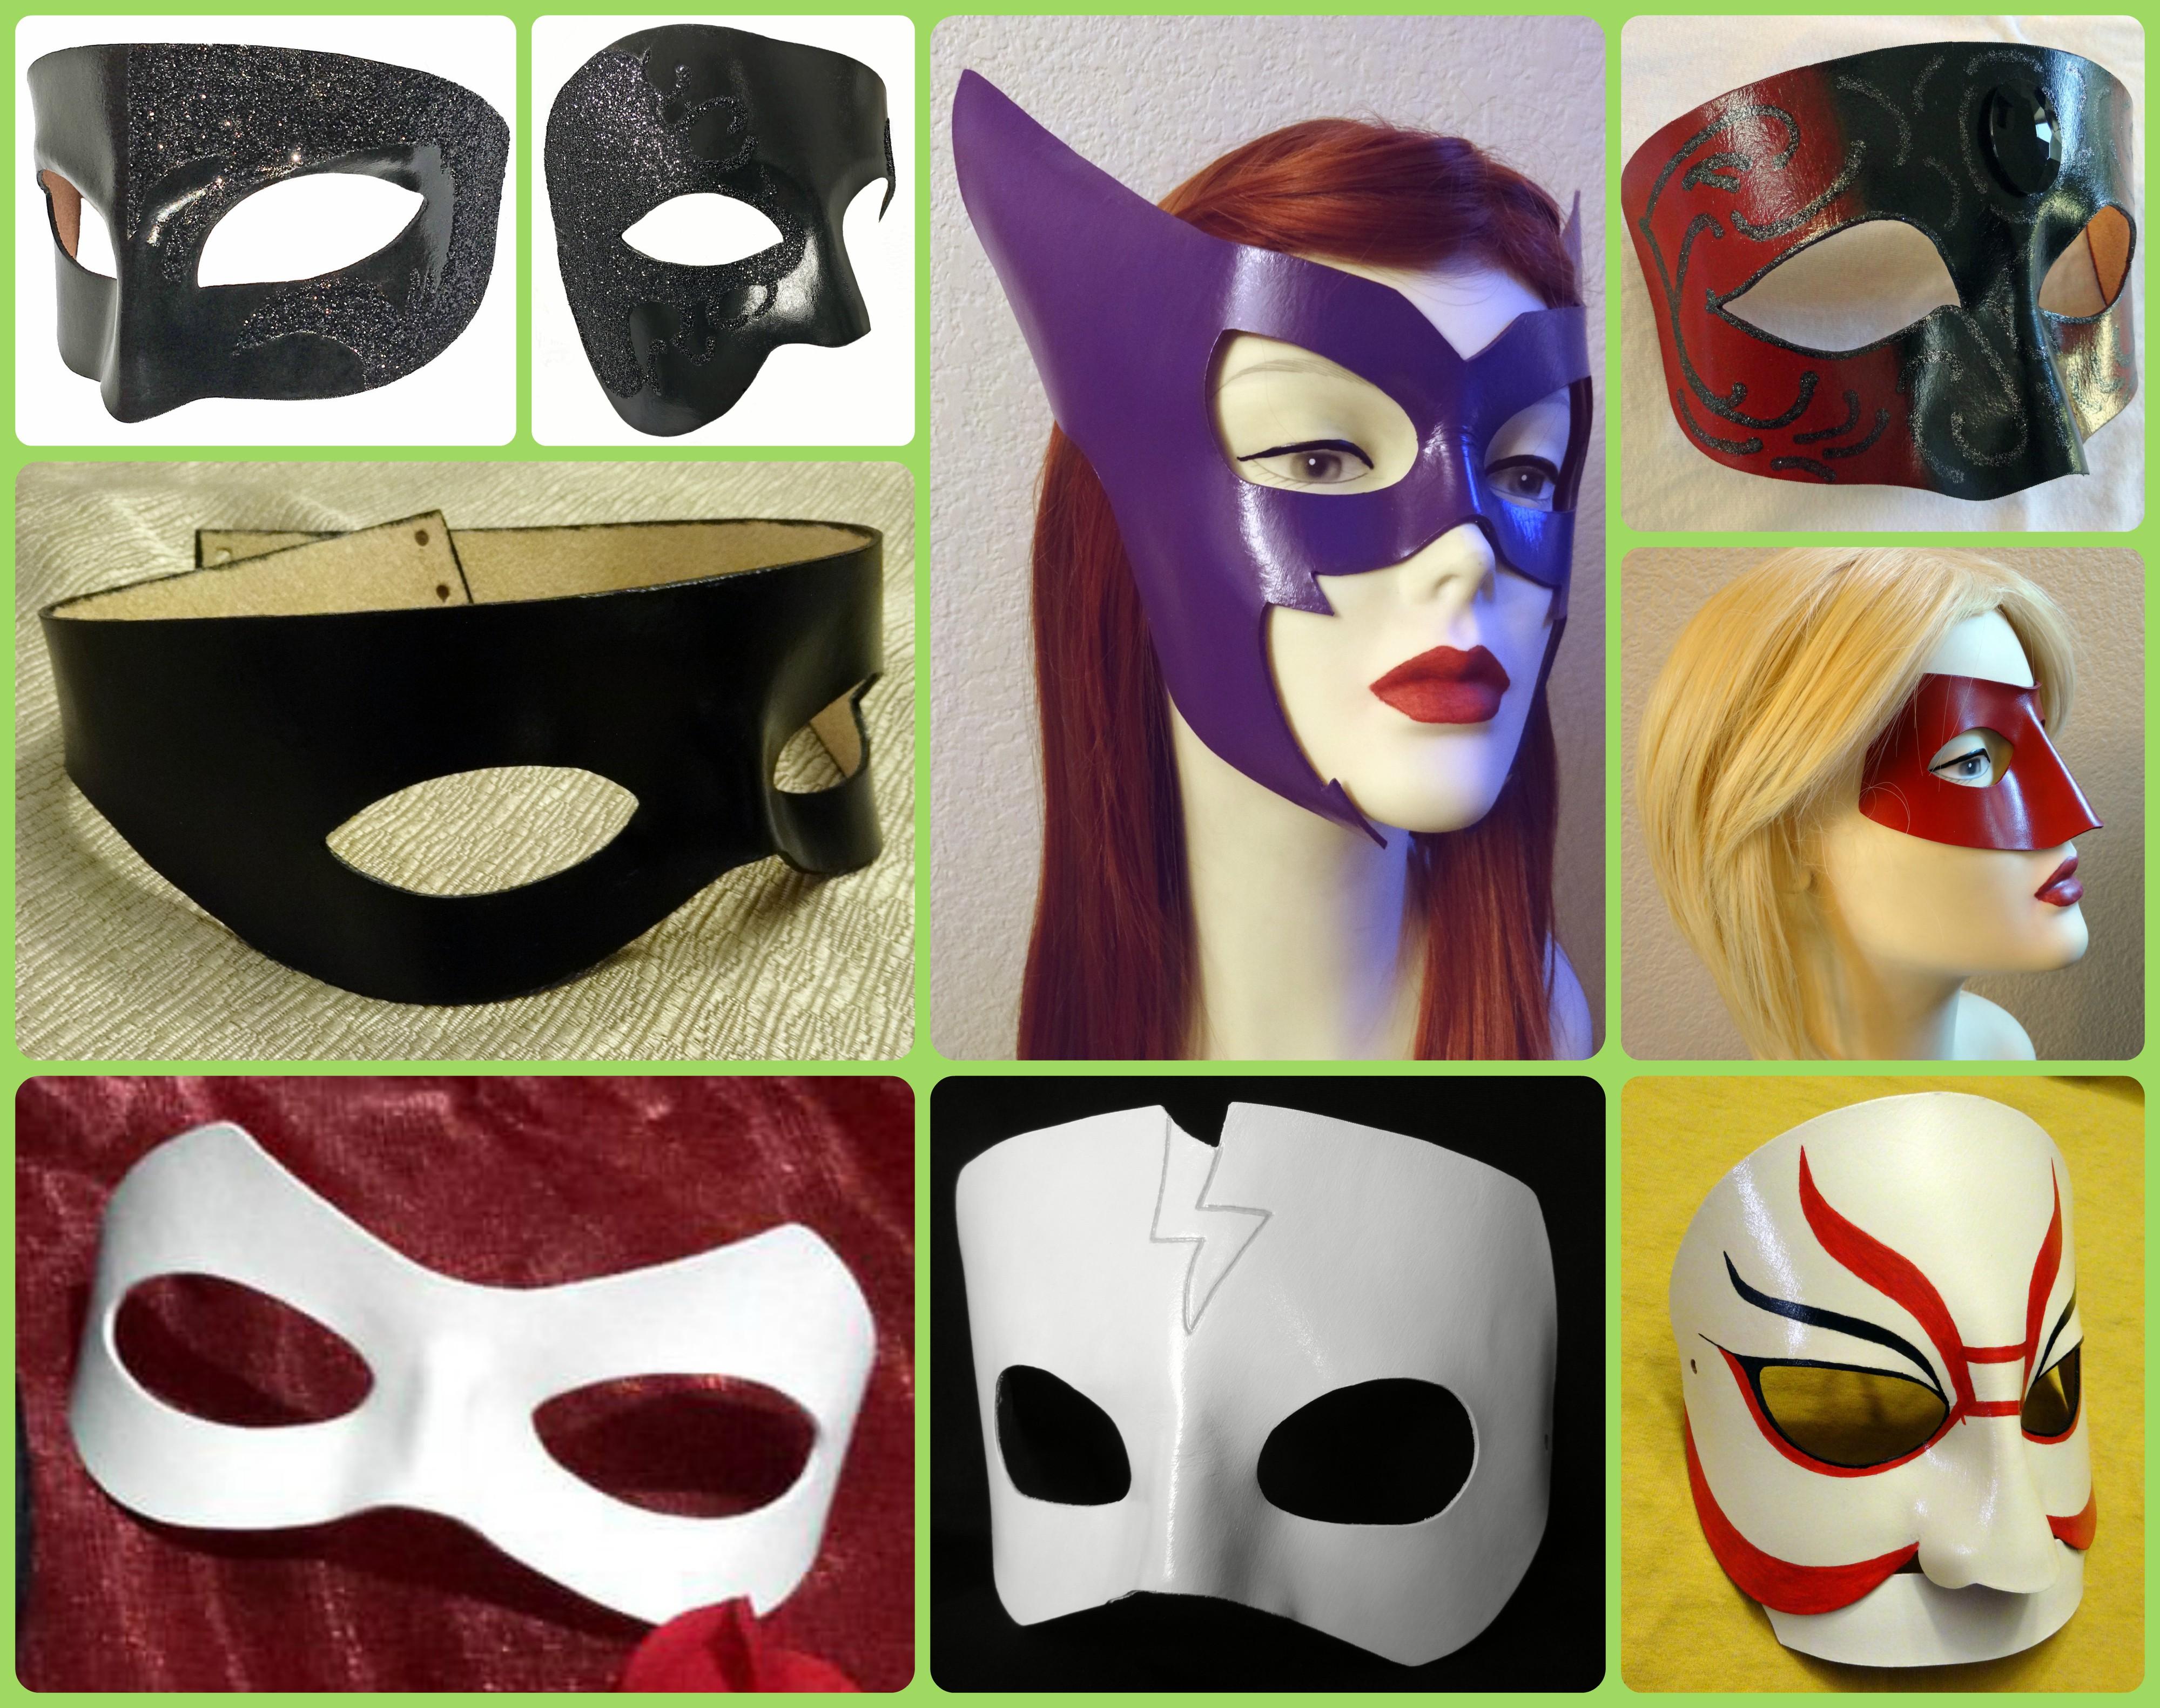 mad-masks-mask-commissions.jpg